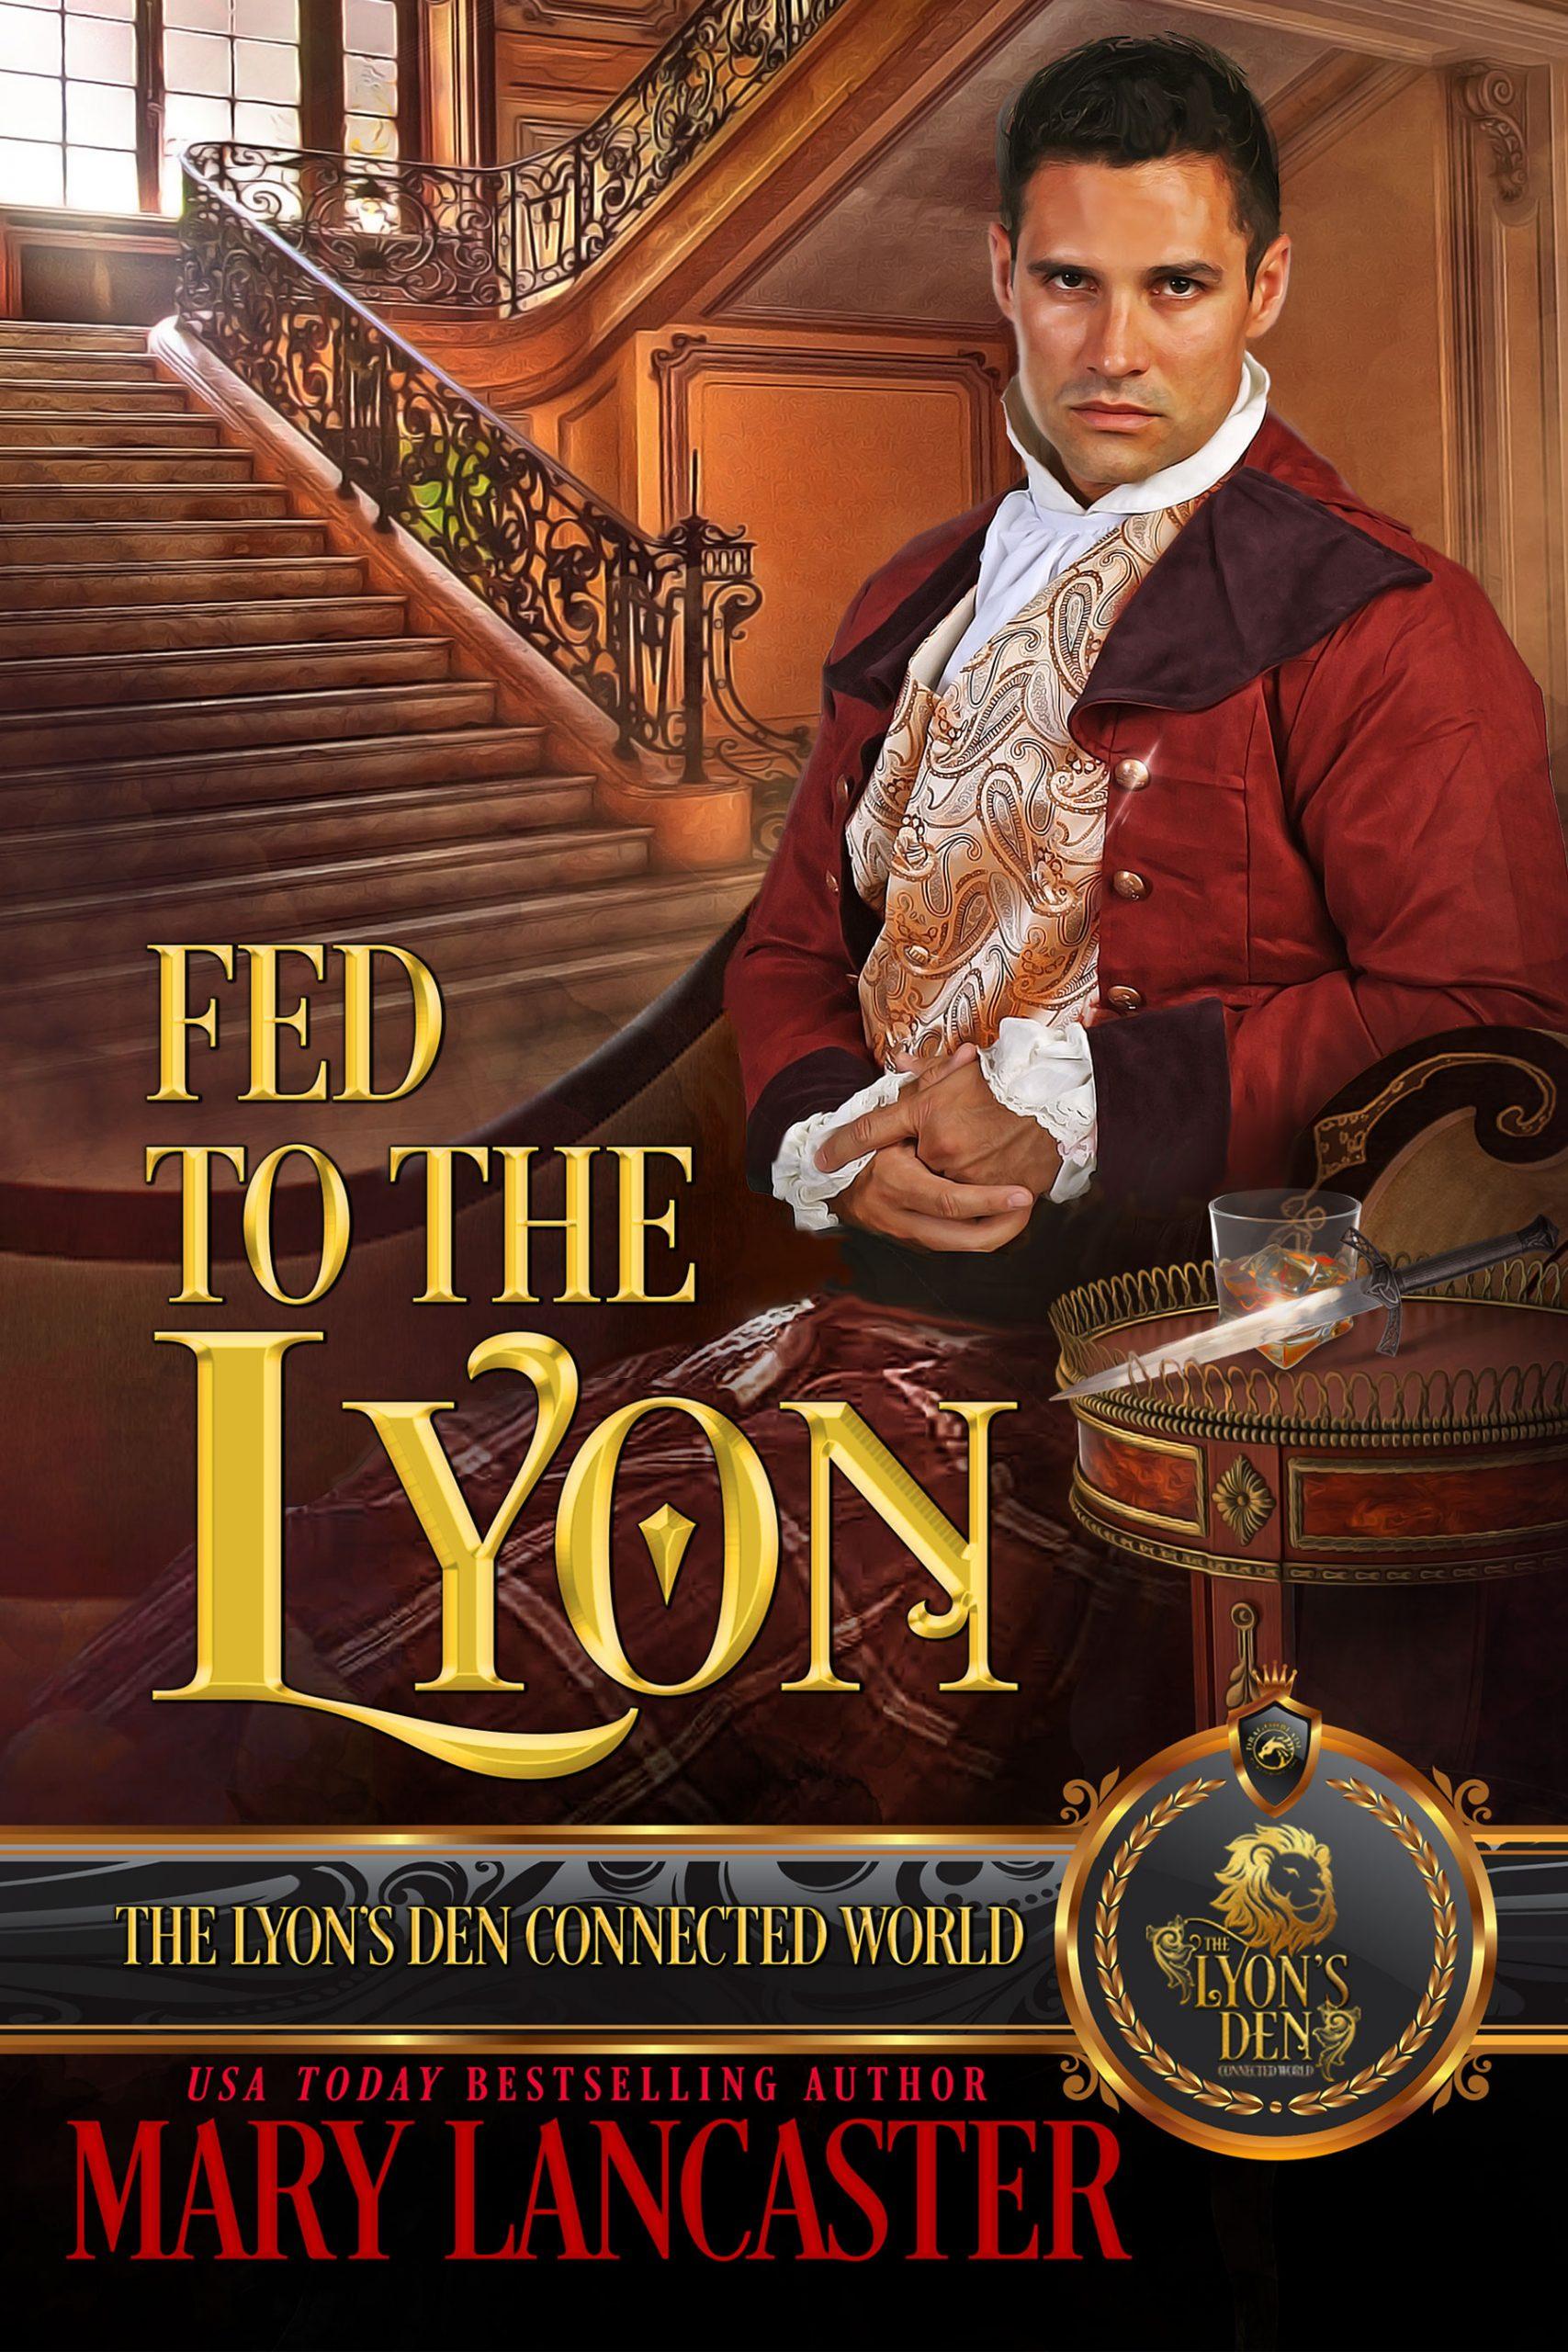 Fed to the Lyon (Lyon's Den novella)